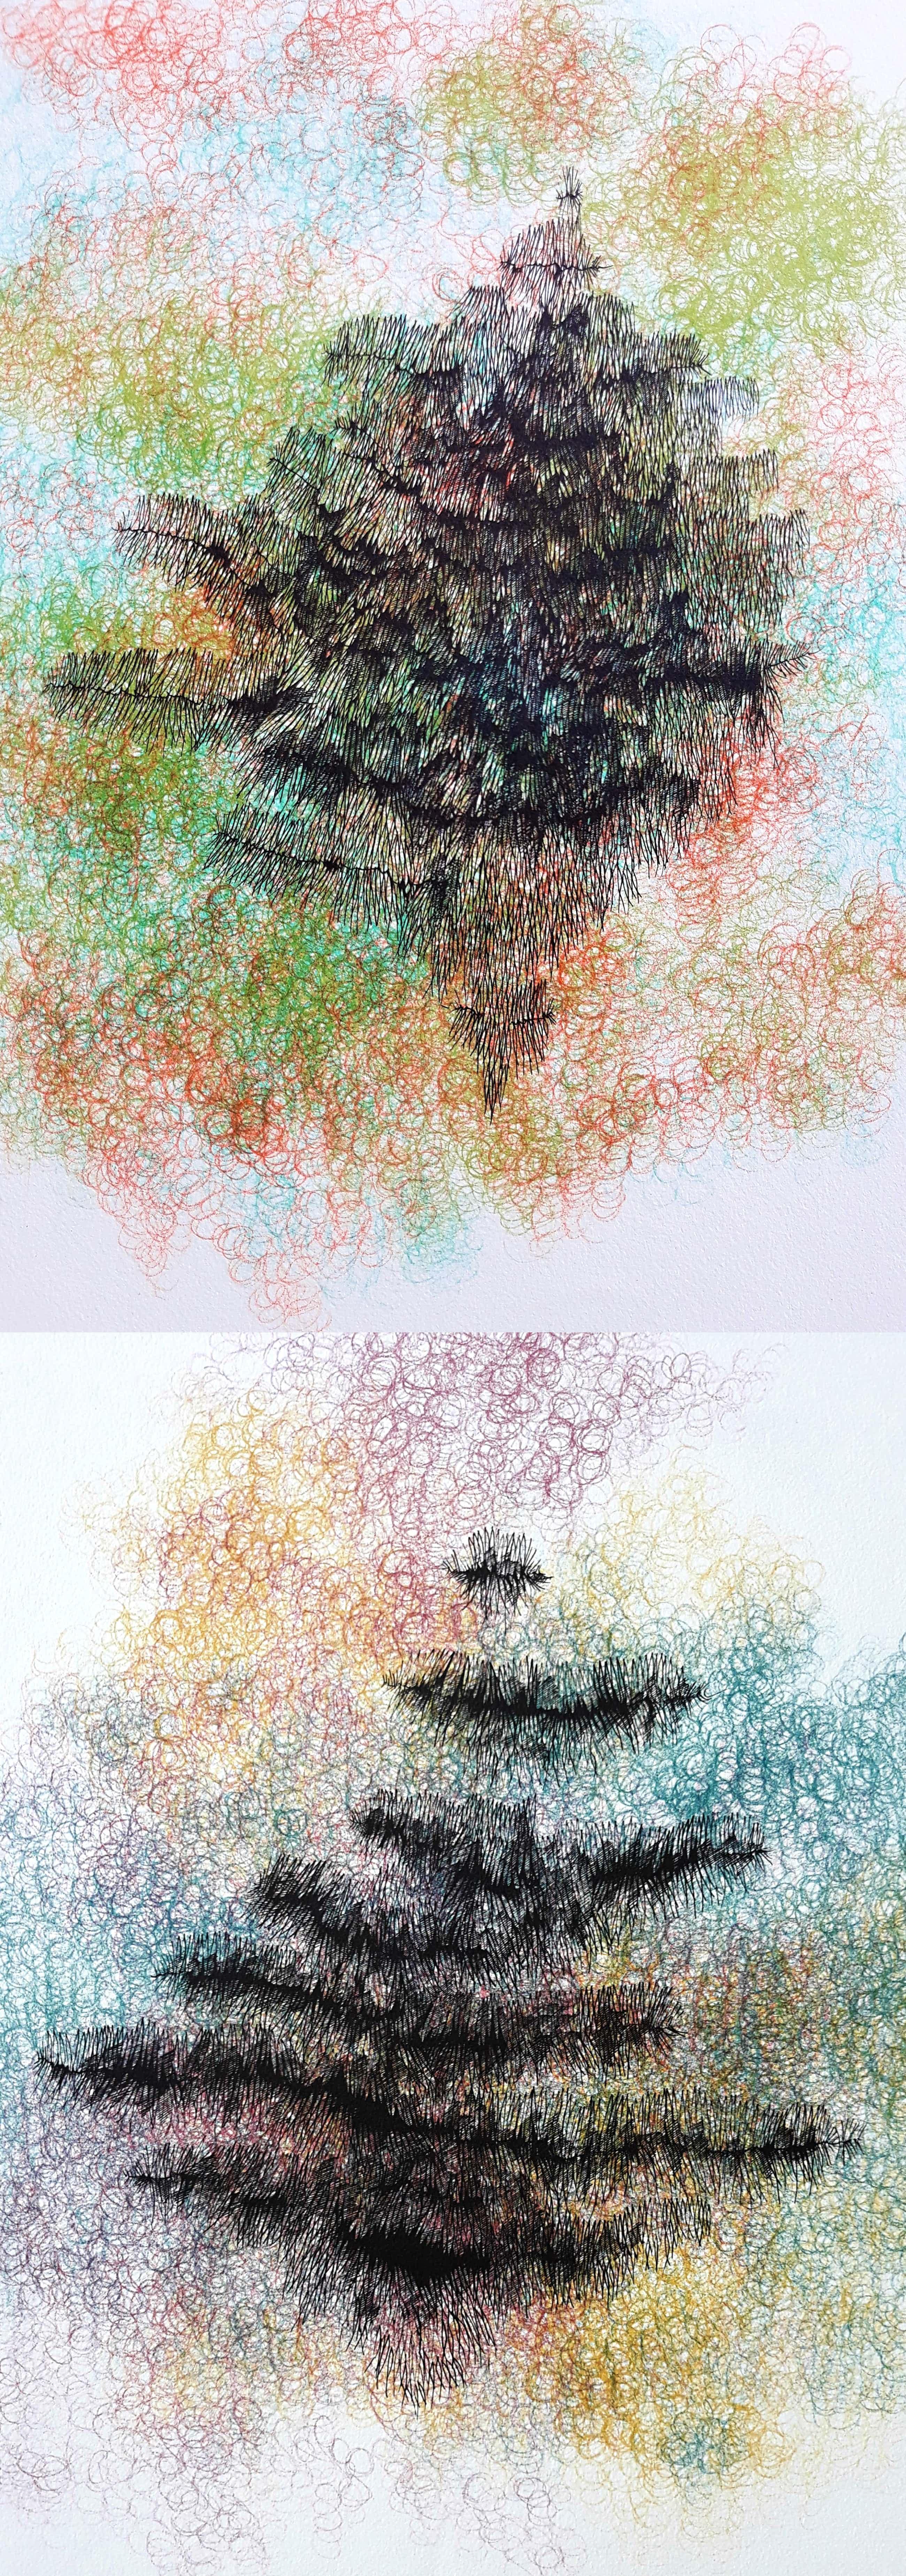 Yoshiko Noma - Sous les Arbres & Eau d'artifice, litho (2x) kopen? Bied vanaf 175!